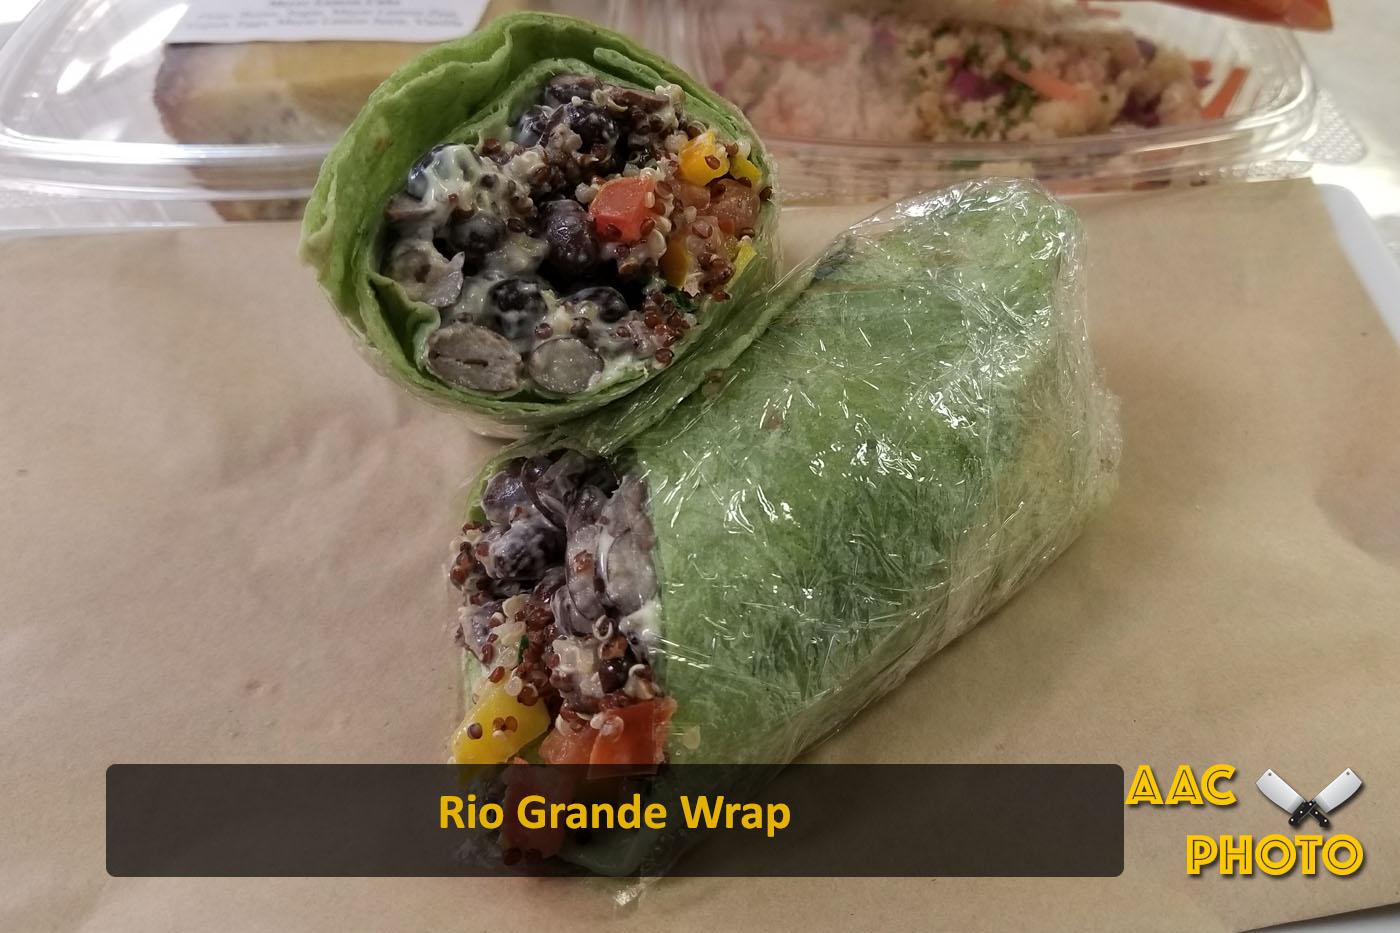 Rio Grande Wrap